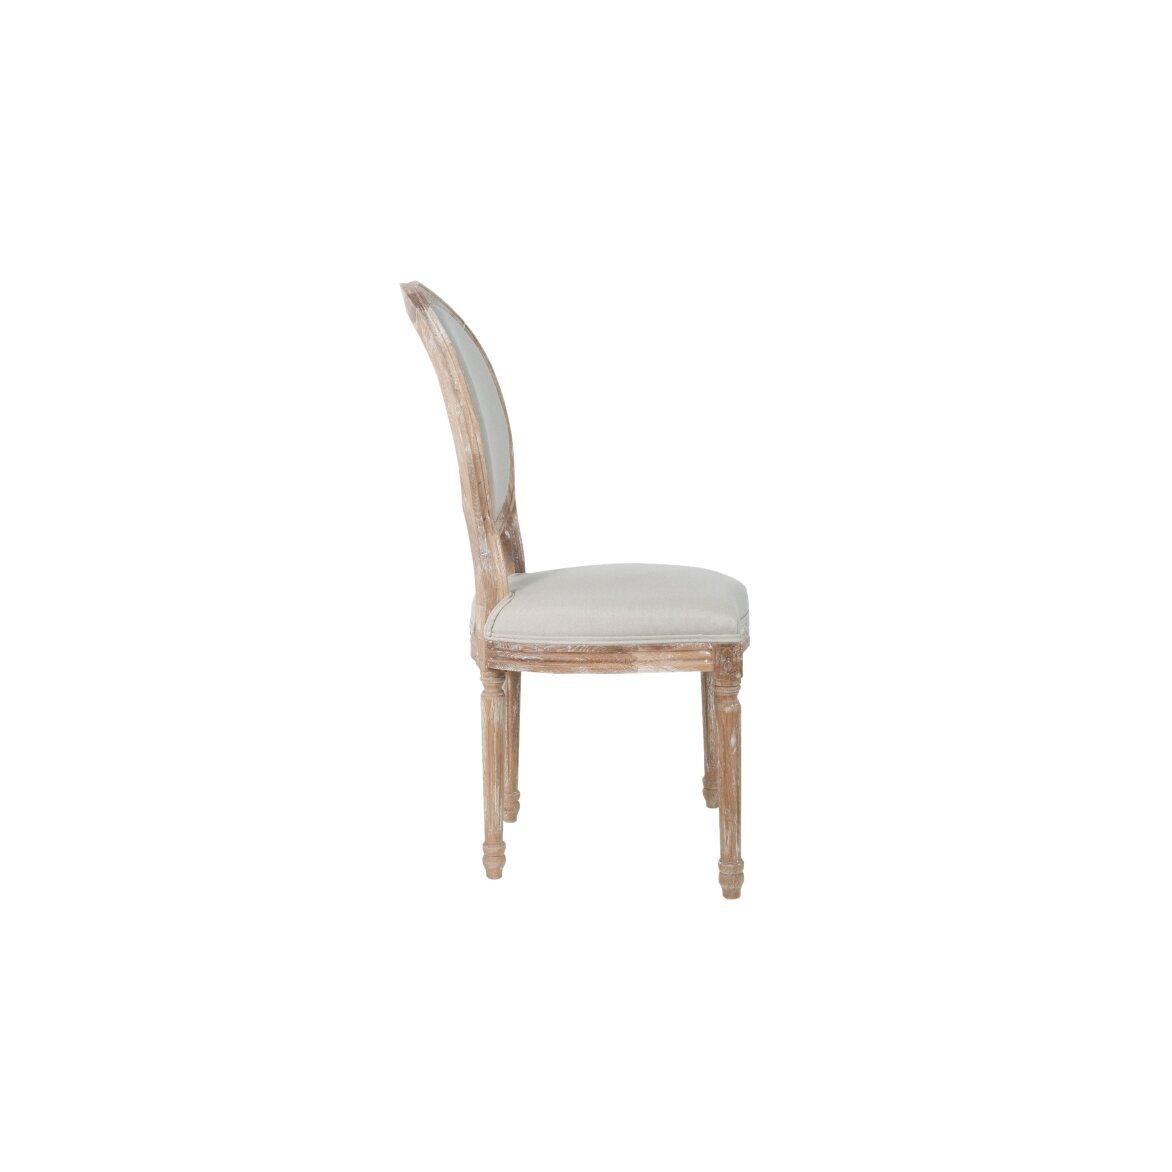 Стул Miro beige 2 | Обеденные стулья Kingsby